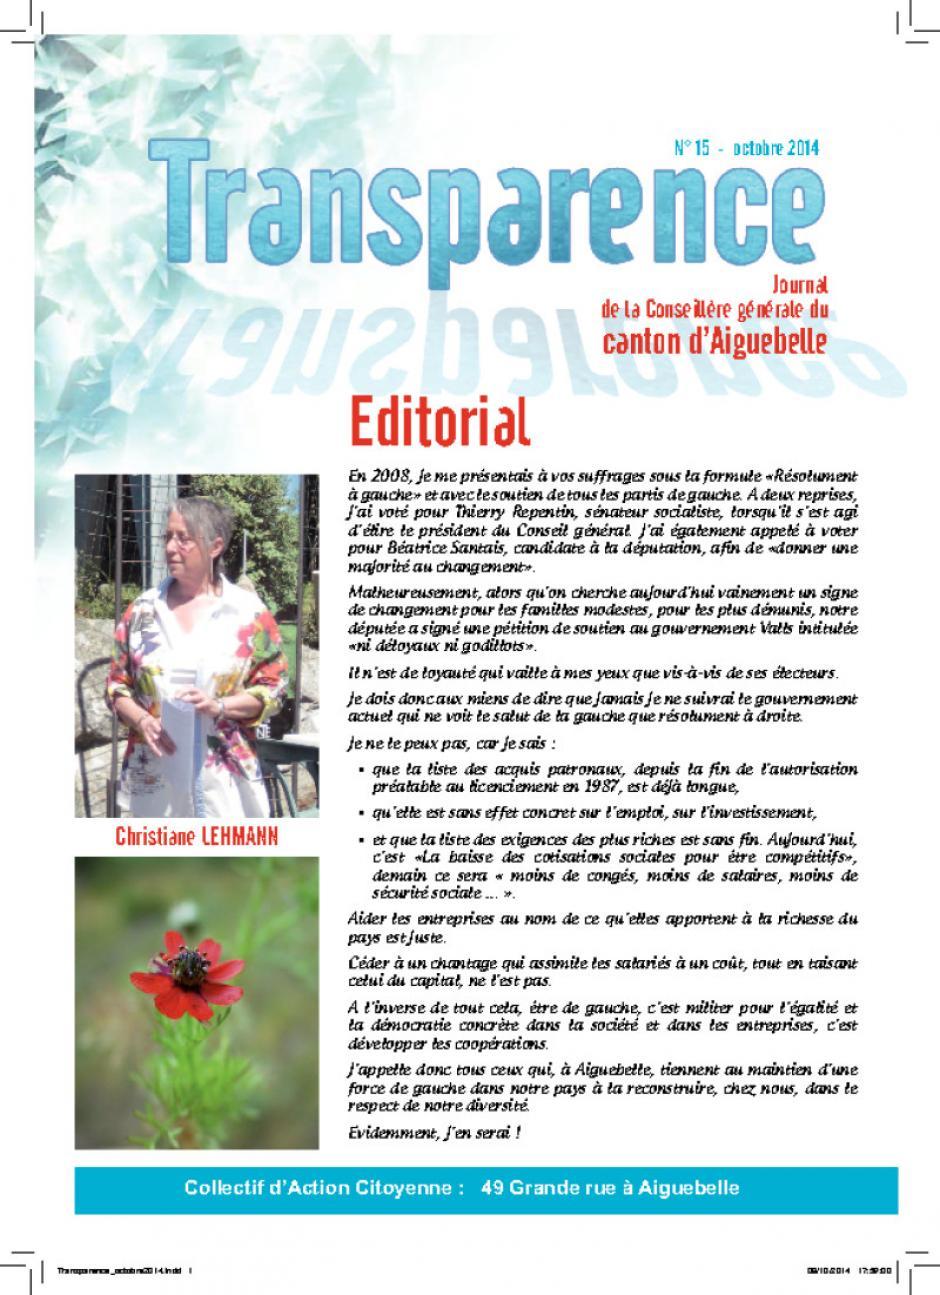 Transparence n°15 - Octobre 2O14